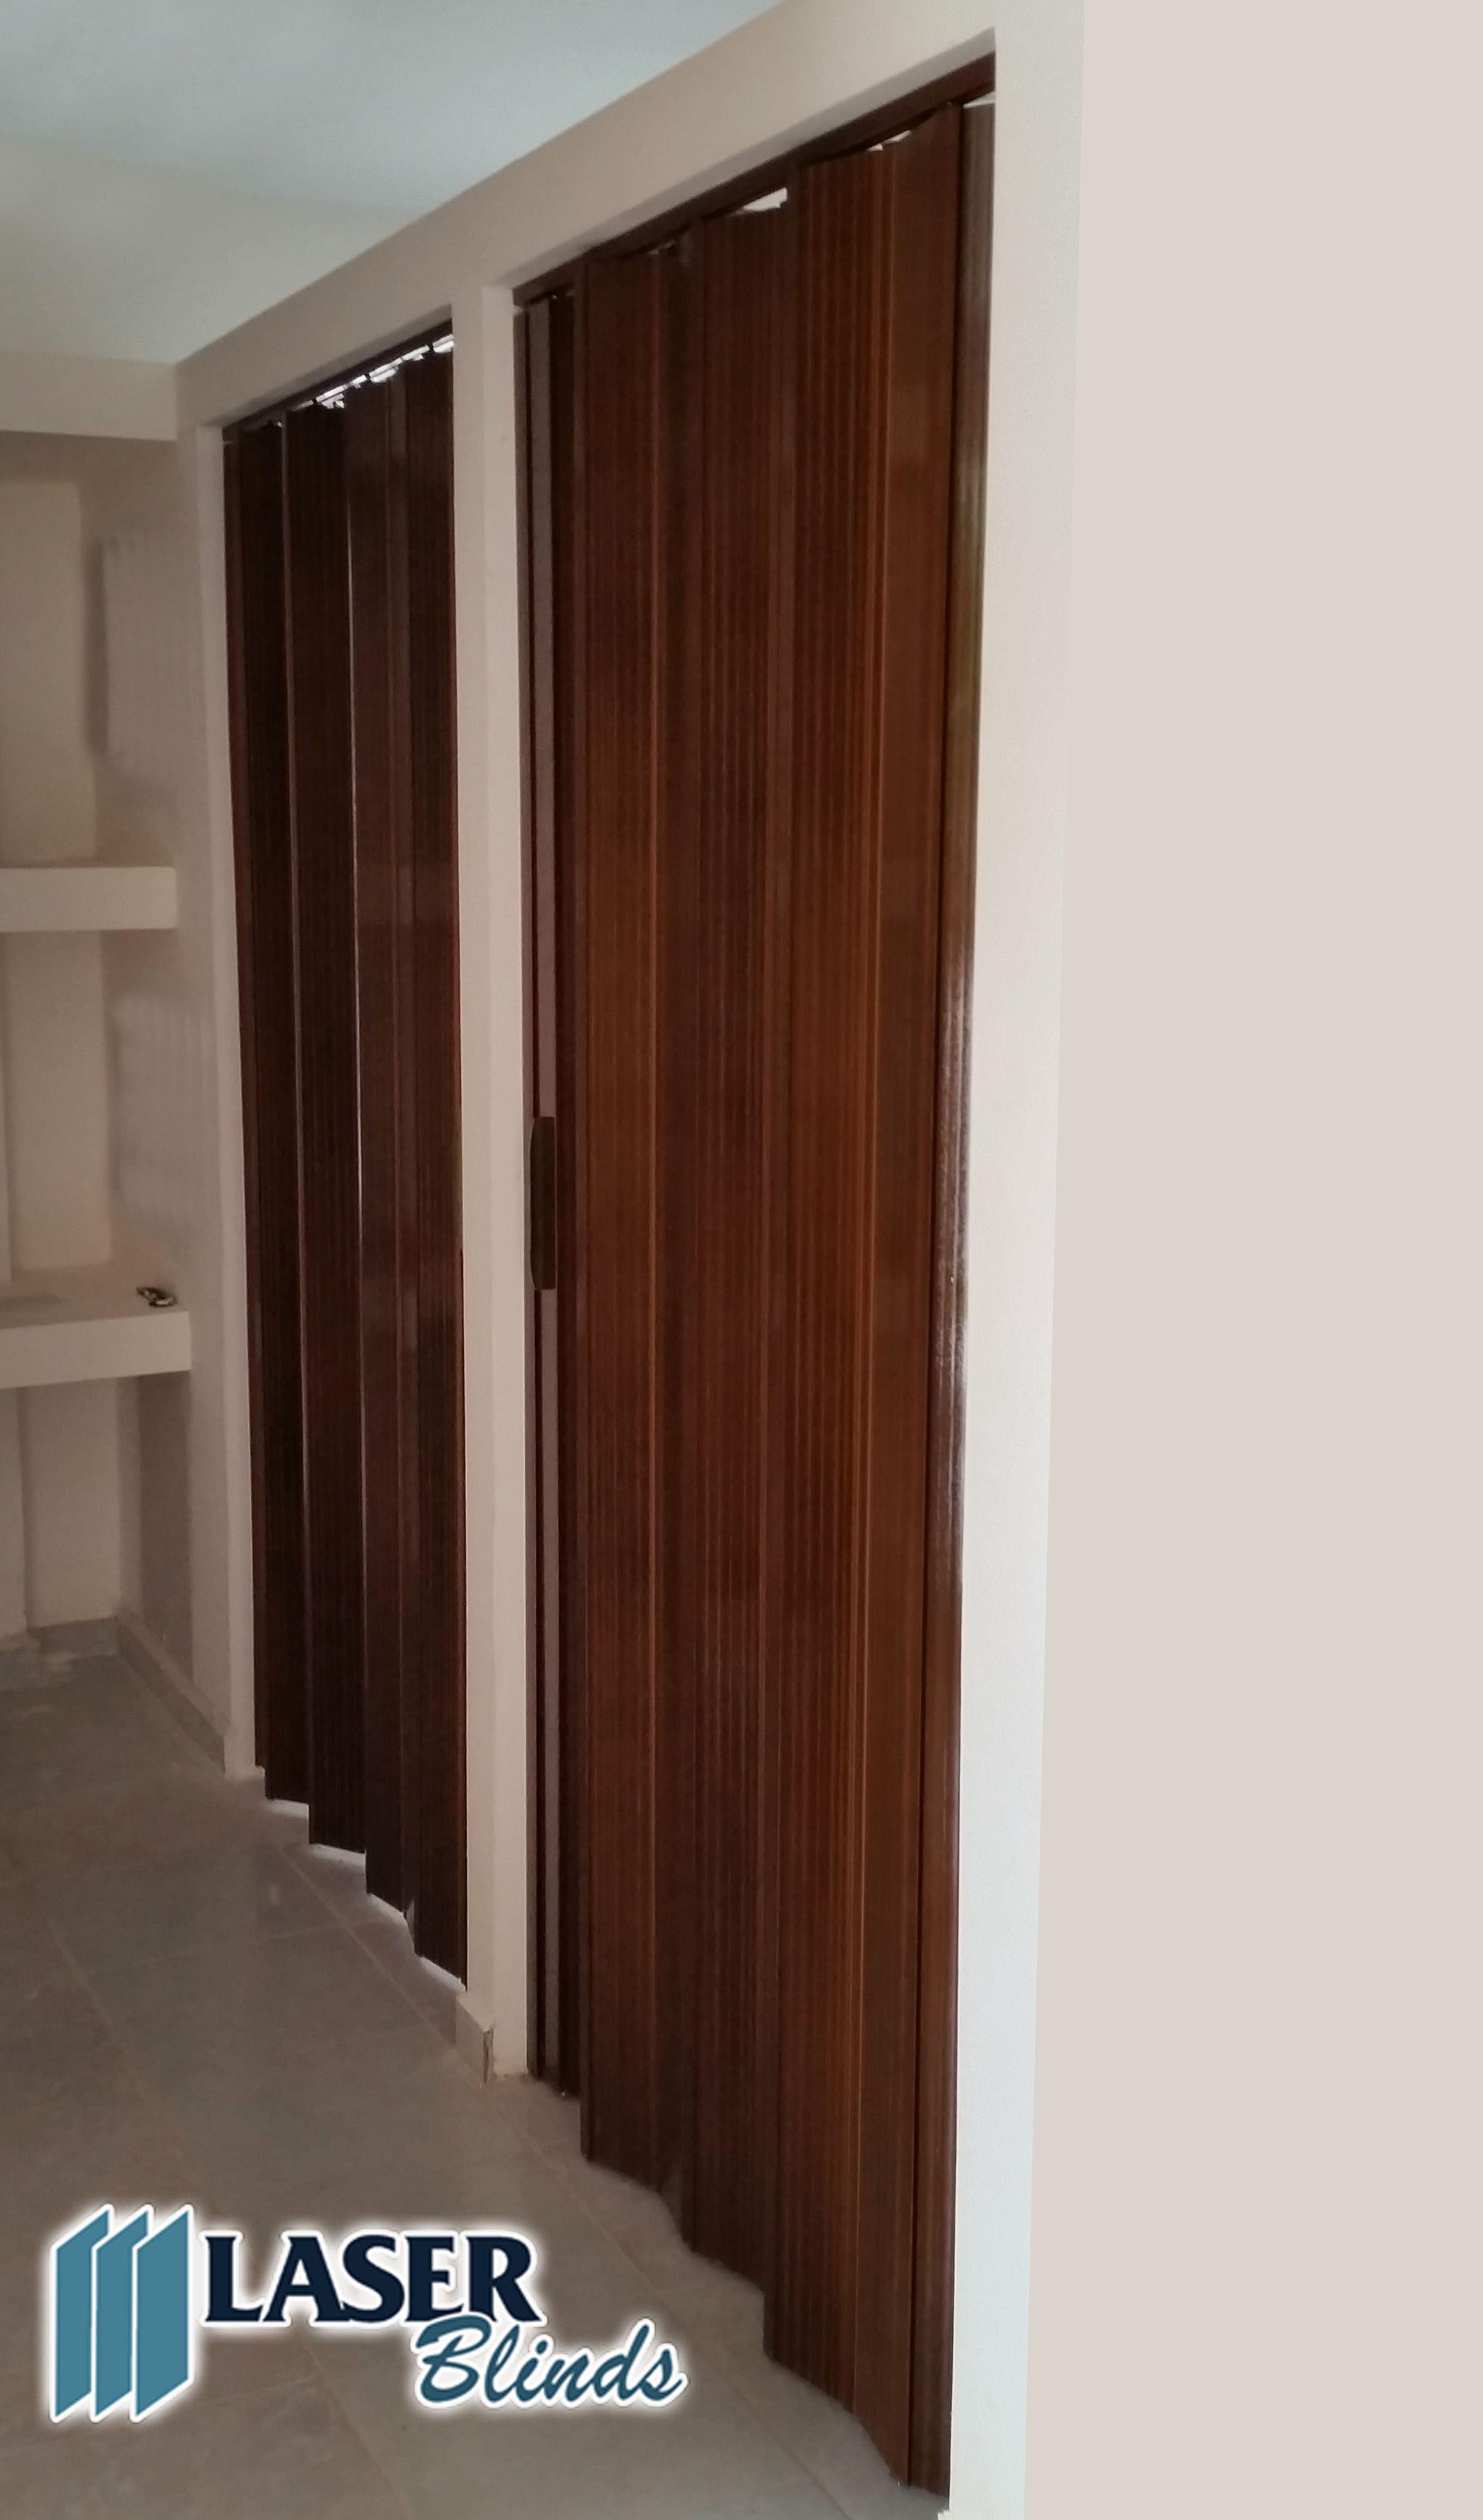 Puertas plegables de pvc color caoba - Fabrica de puertas plegables ...